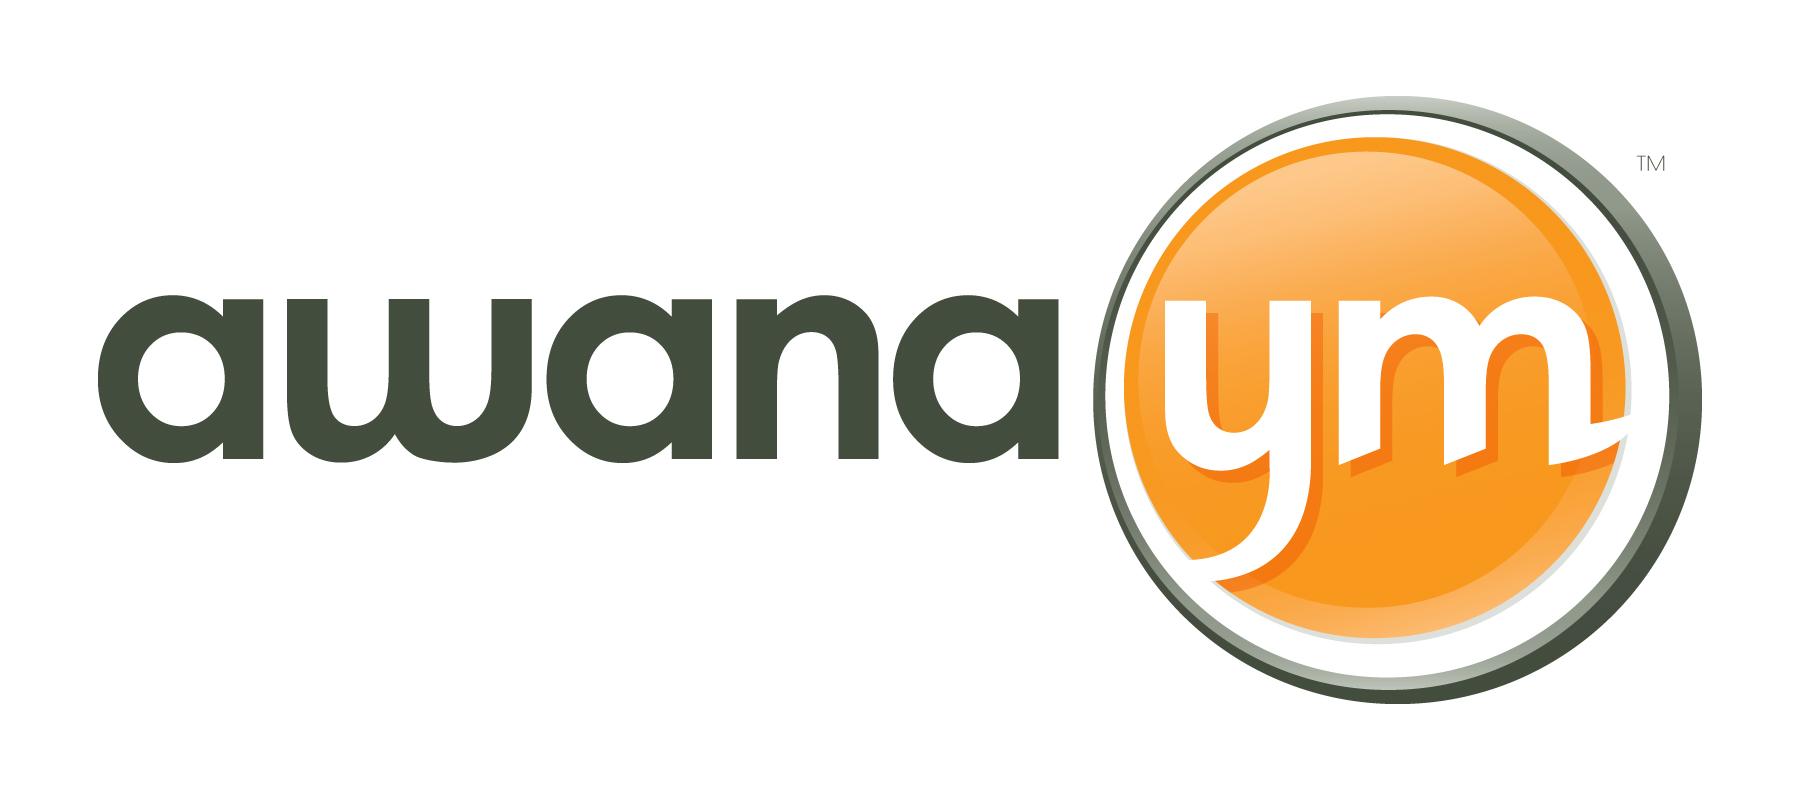 Free Awana Leadership Cliparts, Download Free Clip Art, Free Clip.